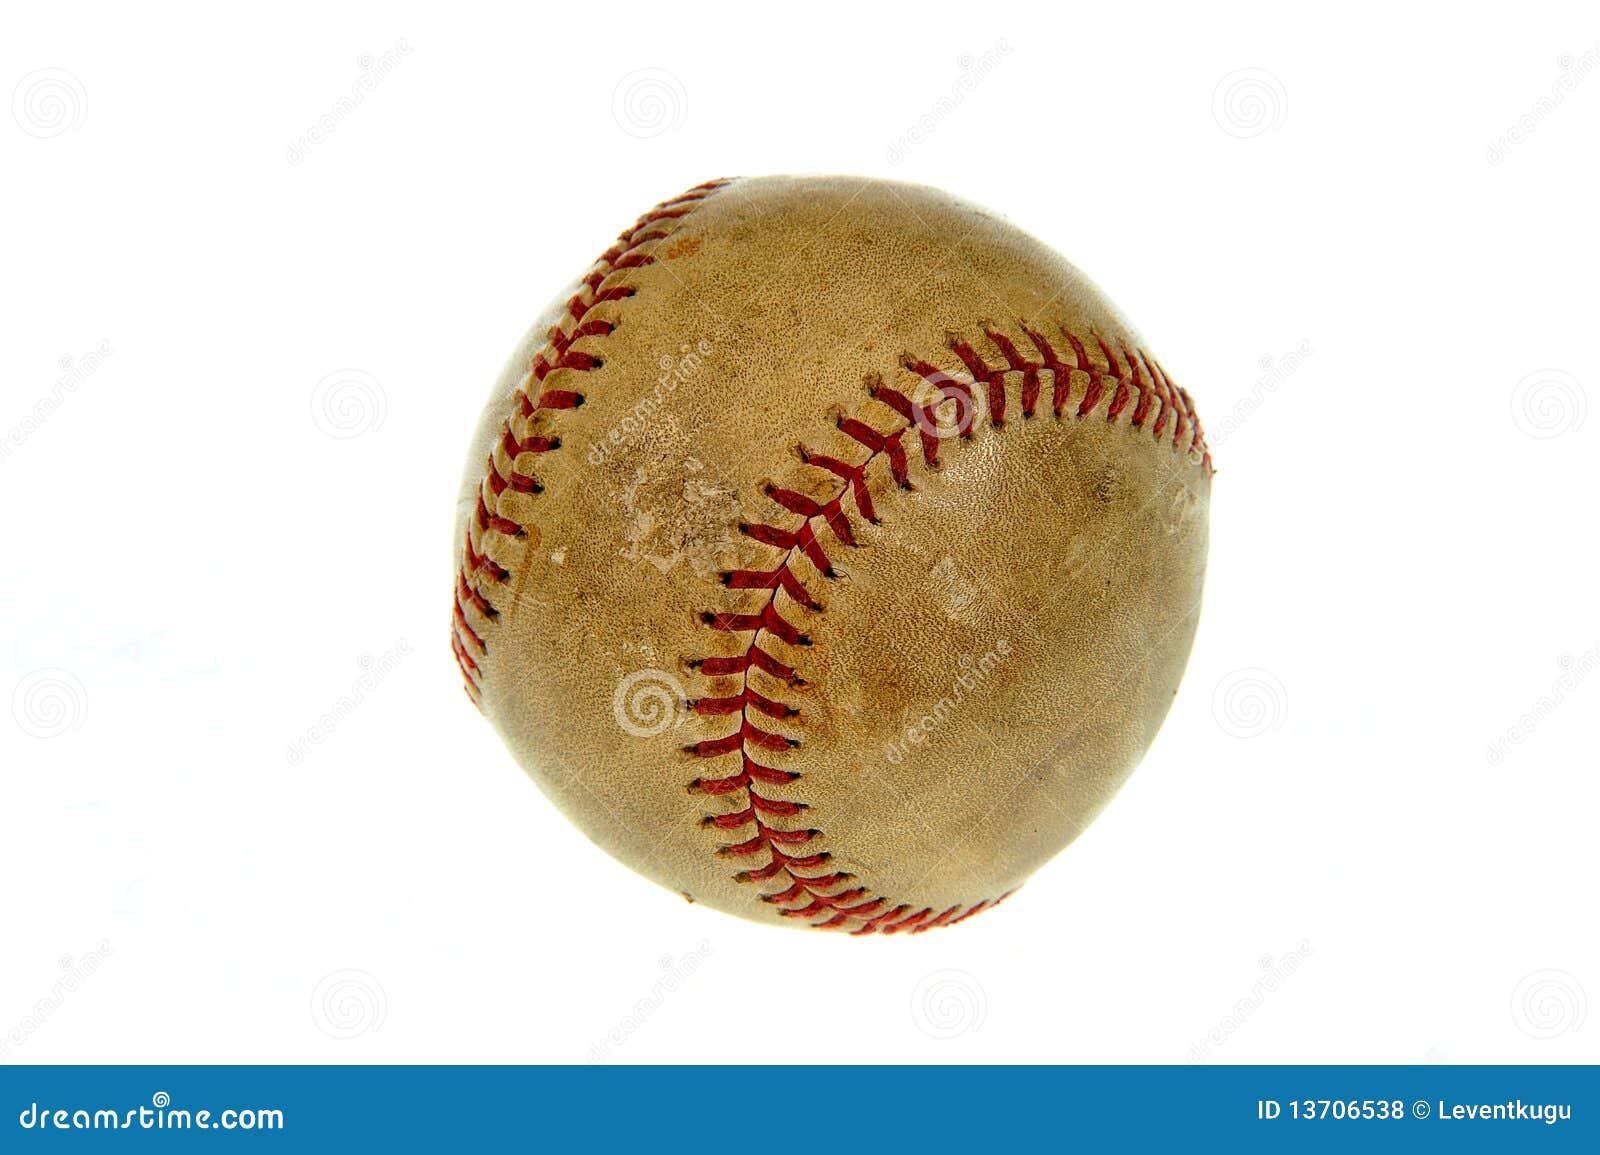 Old baseball ball stock photo. Image of baseball, leather ...